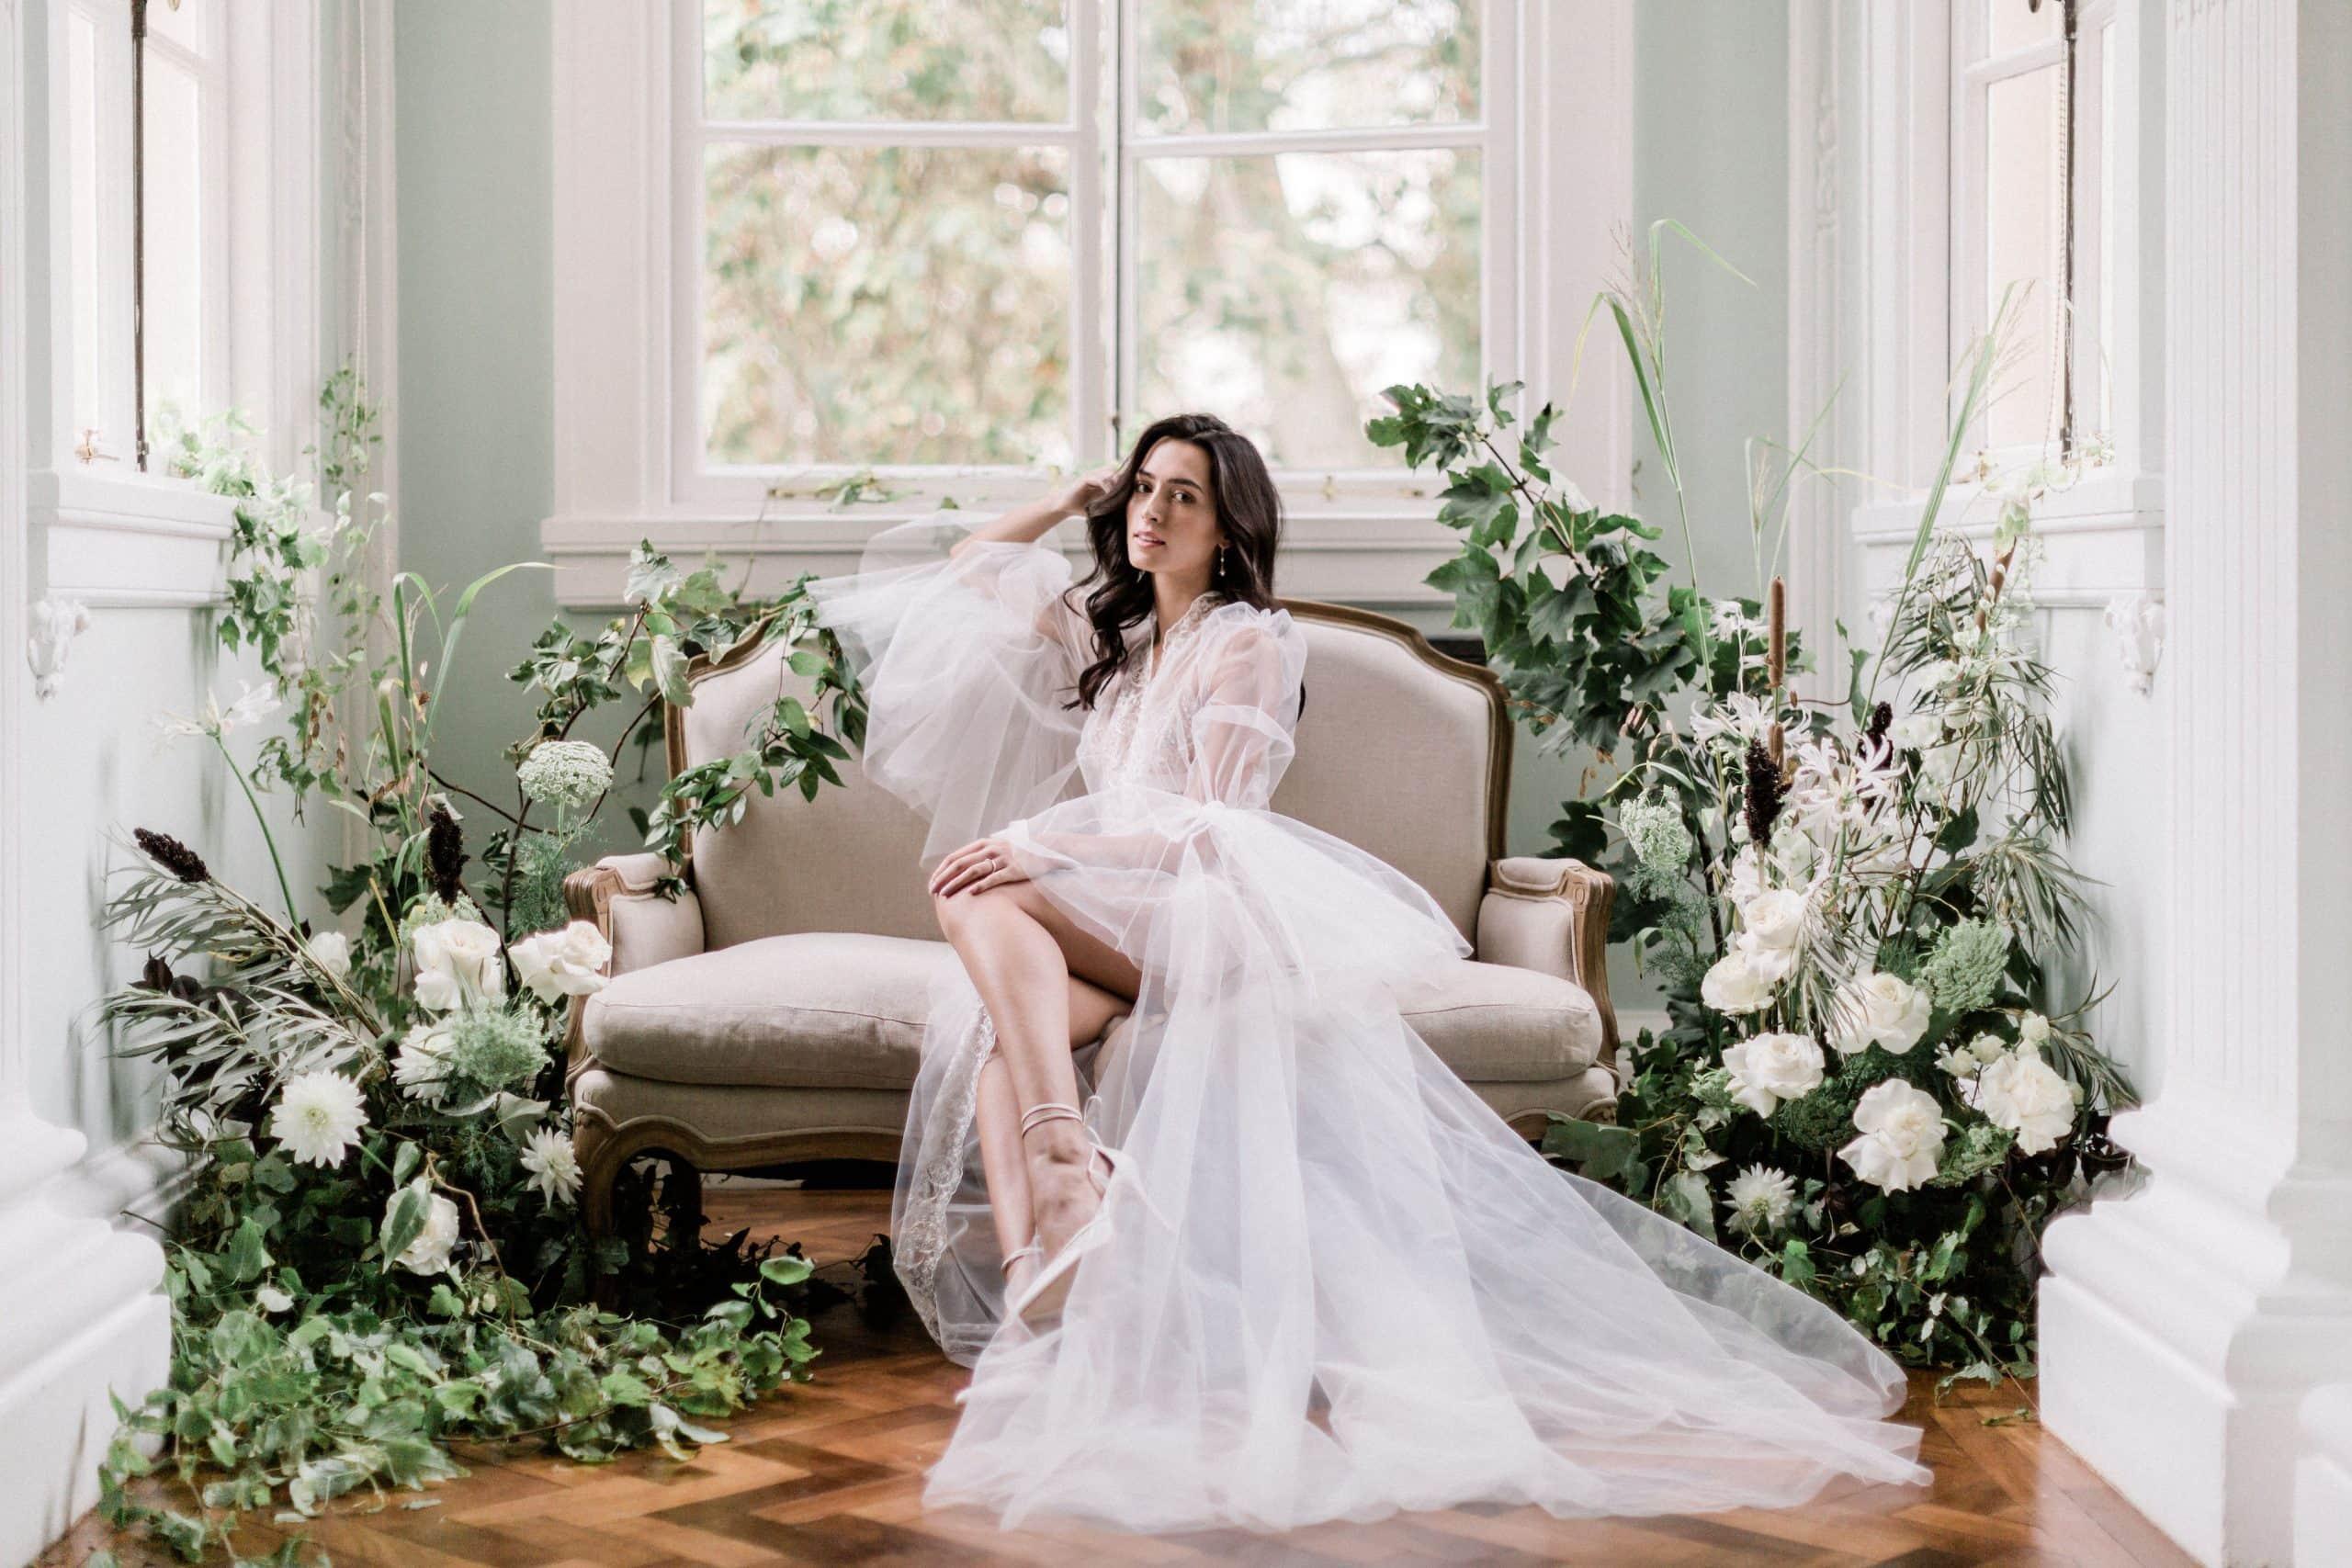 bridalwear-london-scottish-wedding-dress-uk-bespoke-dress-maker-scotland-bride